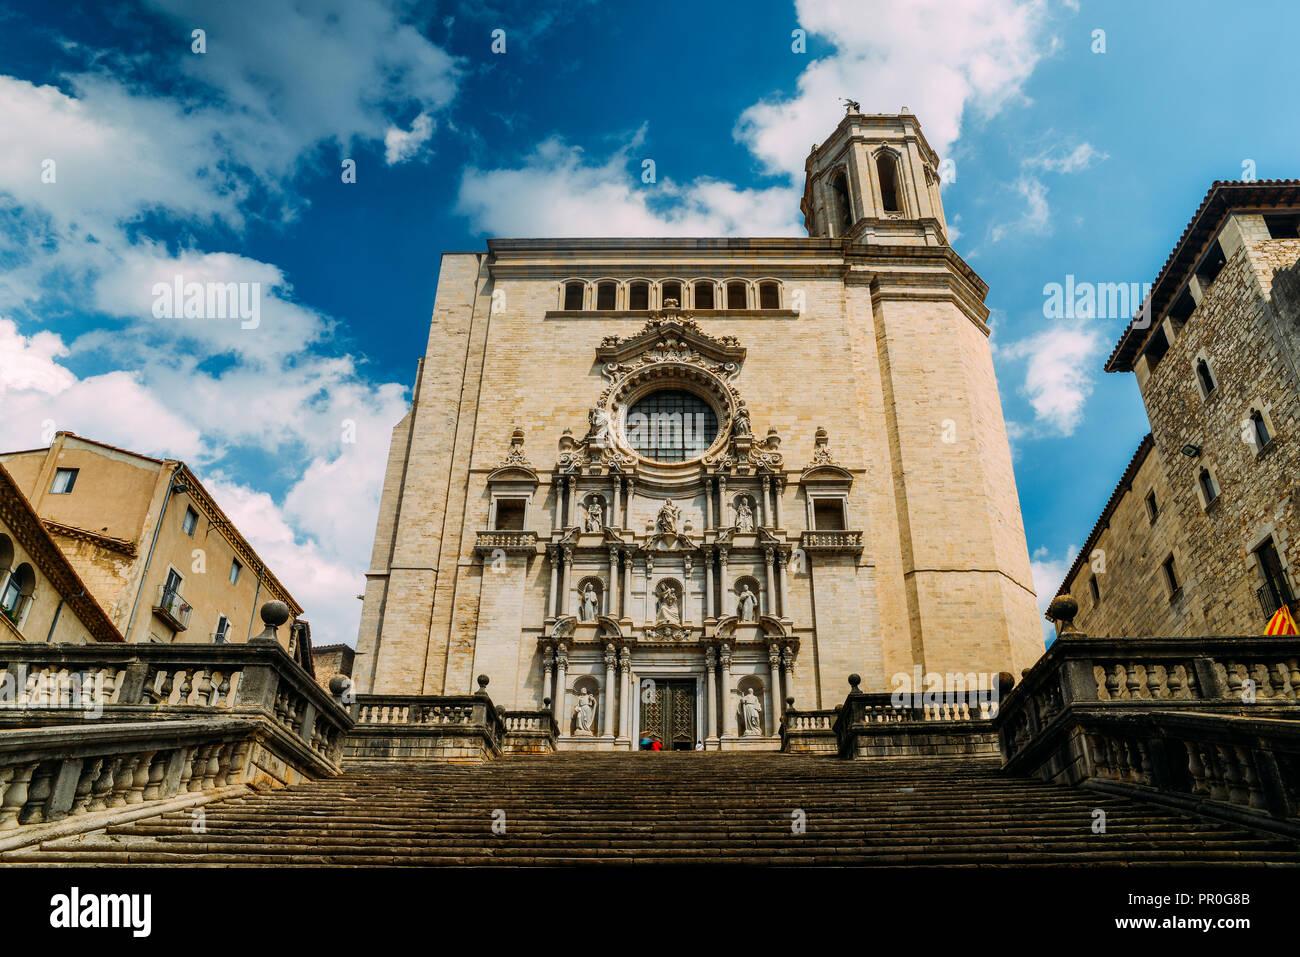 La Catedral De Girona Catedral De Santa Maria De Girona Una